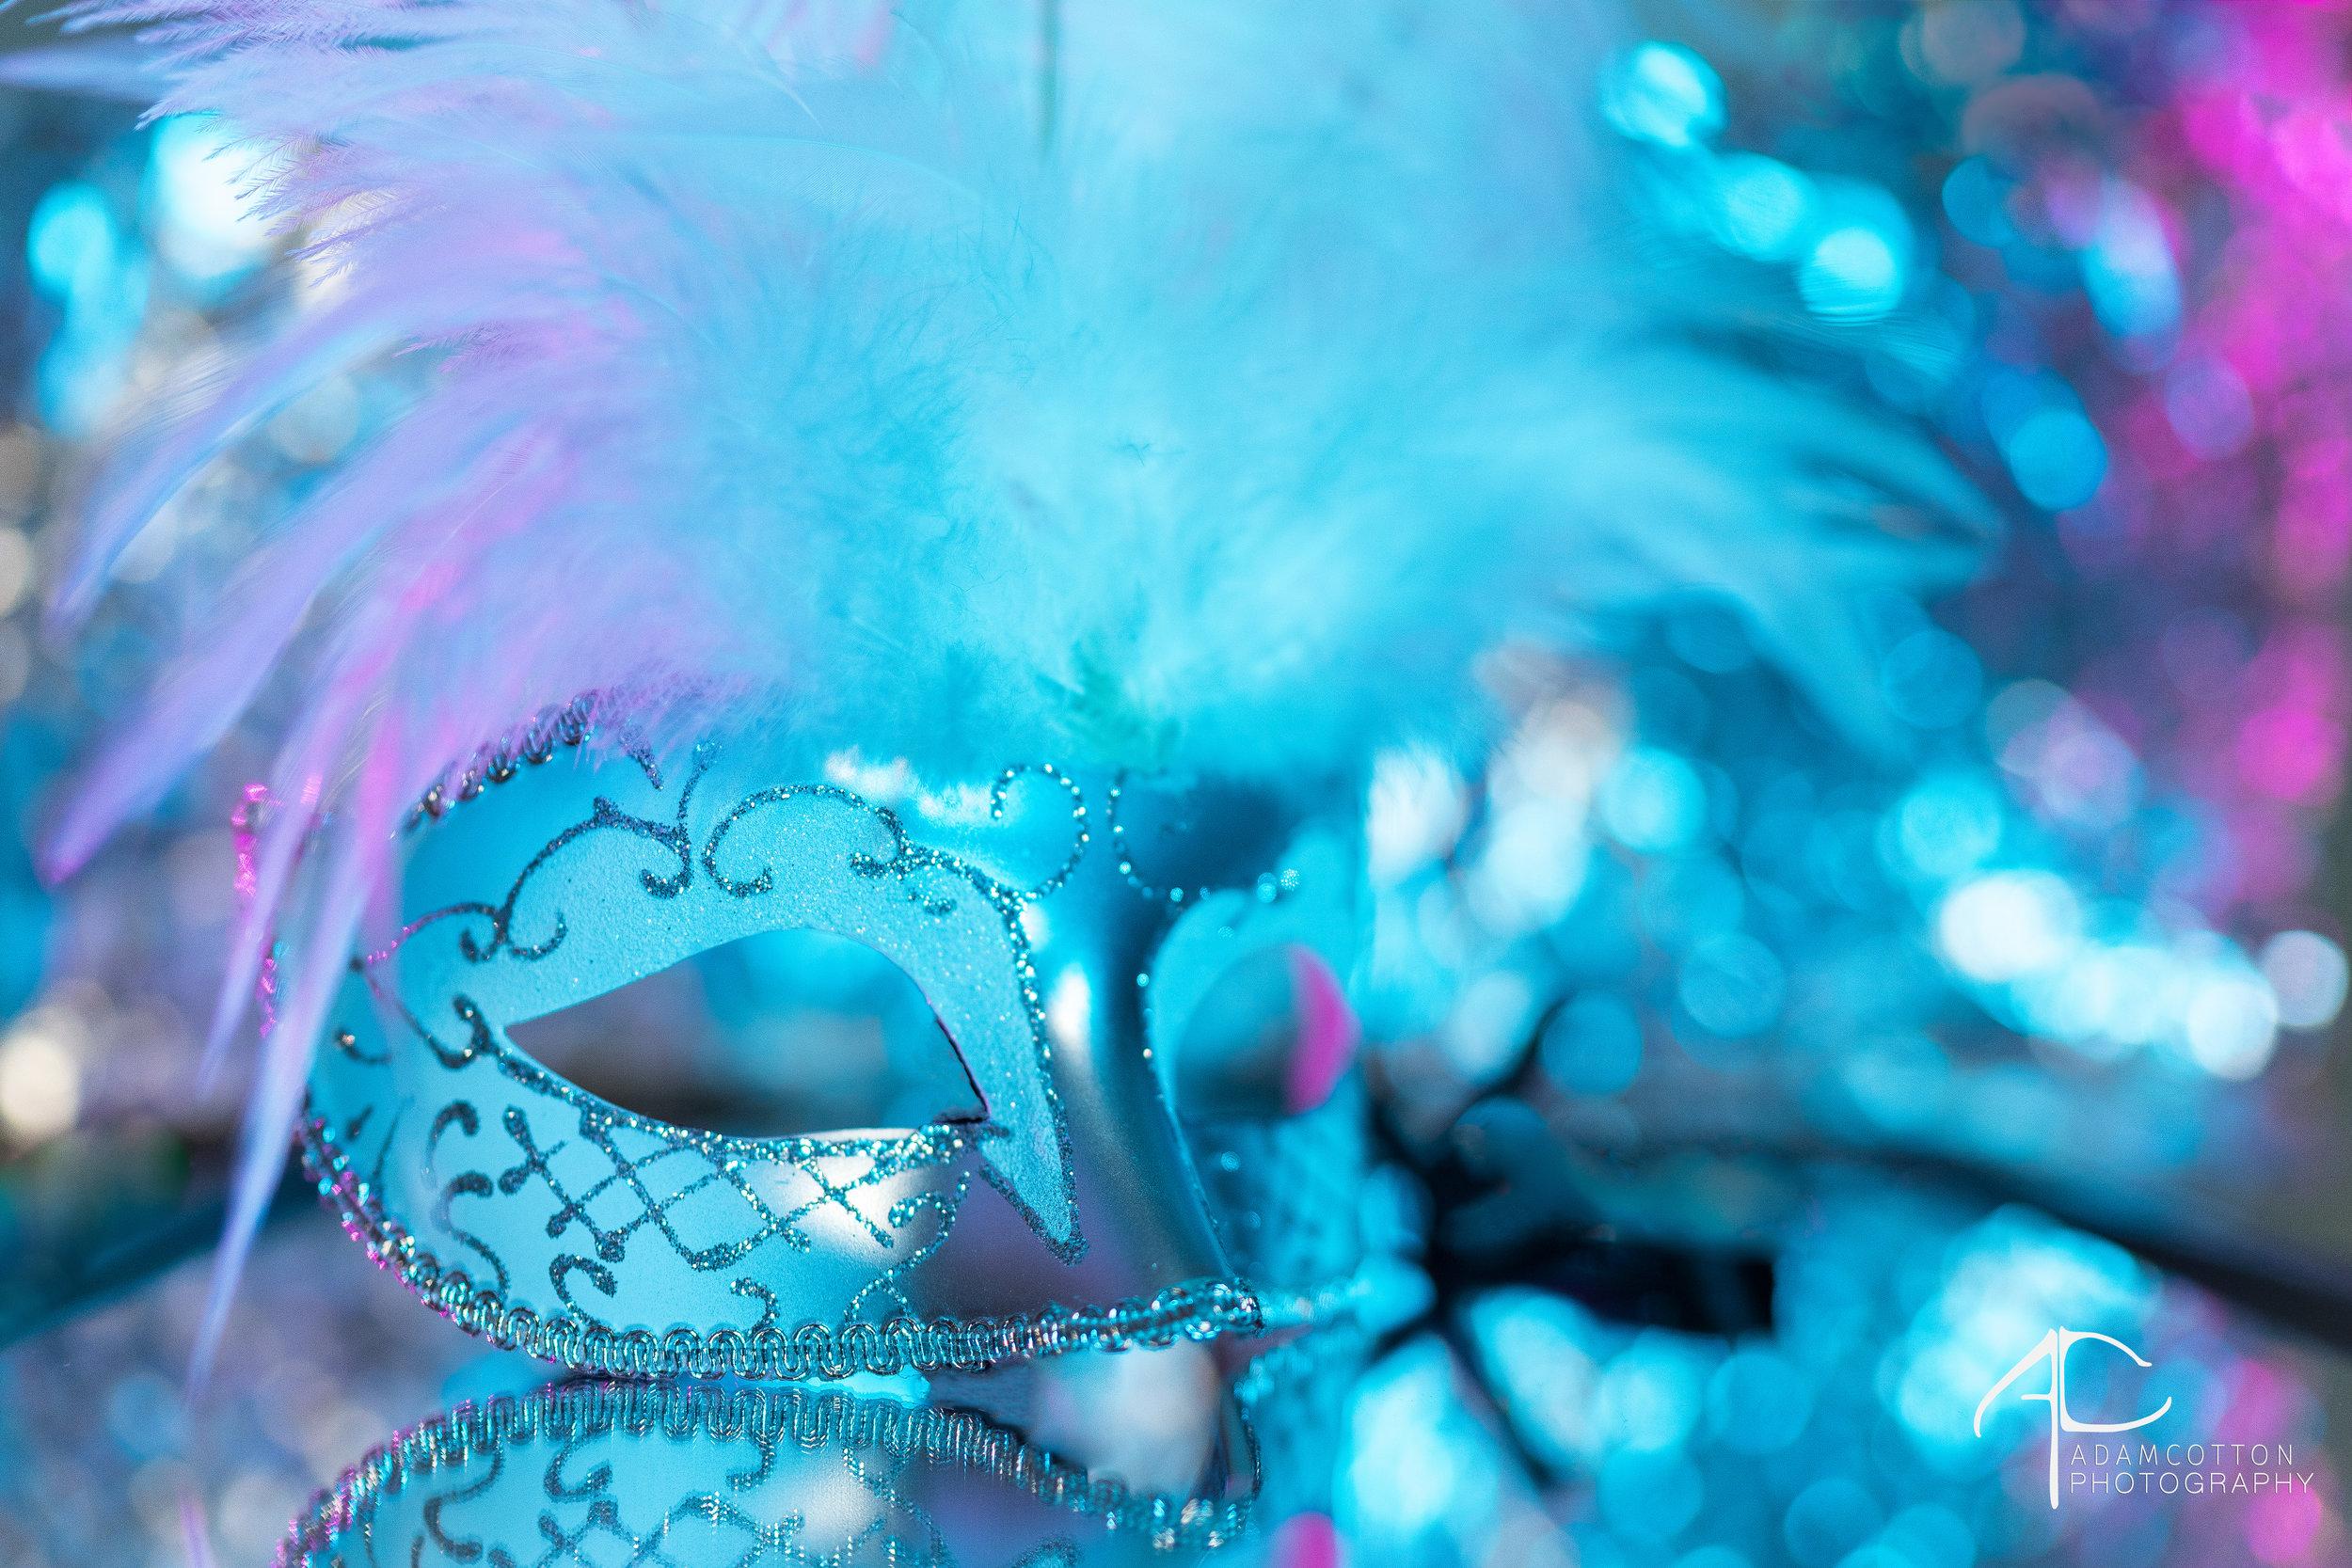 Mardi Gras Mask shot using Sony A7II, Rotolight Neo, 85 GM